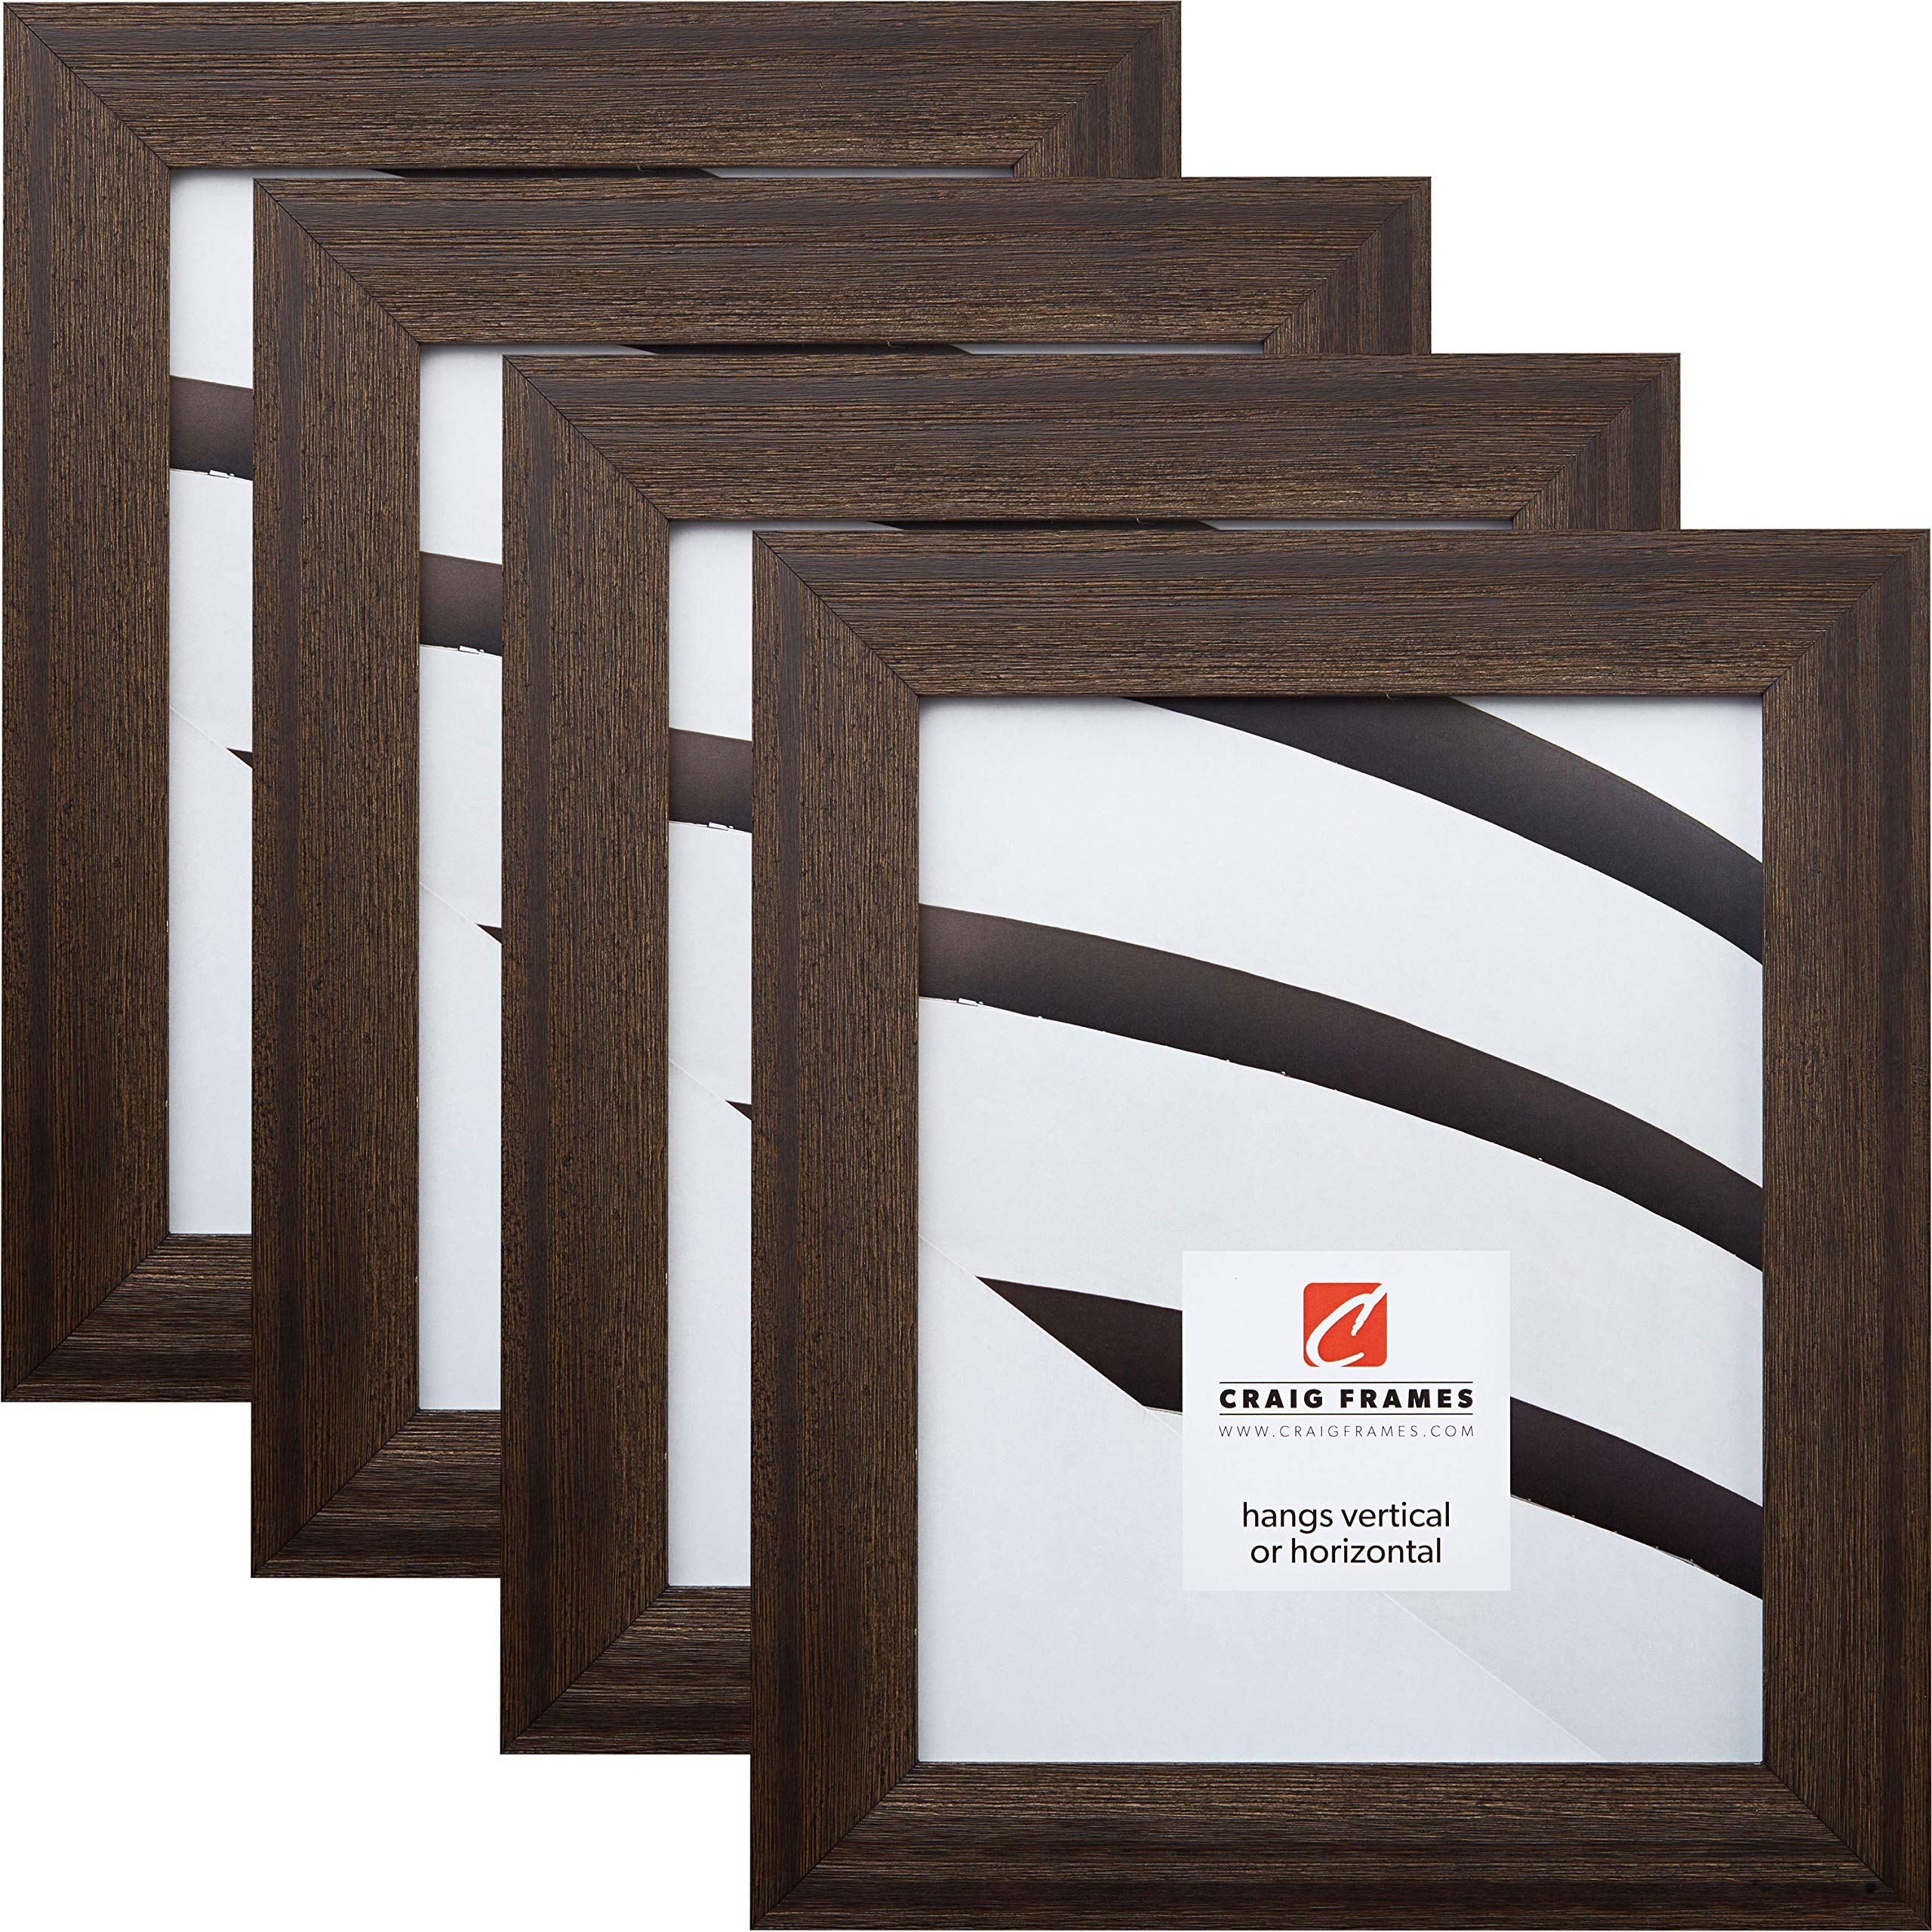 Craig Frames 15DRIFTWOODBK 8 x 10 Inch Picture Frame, Black, Set of 4